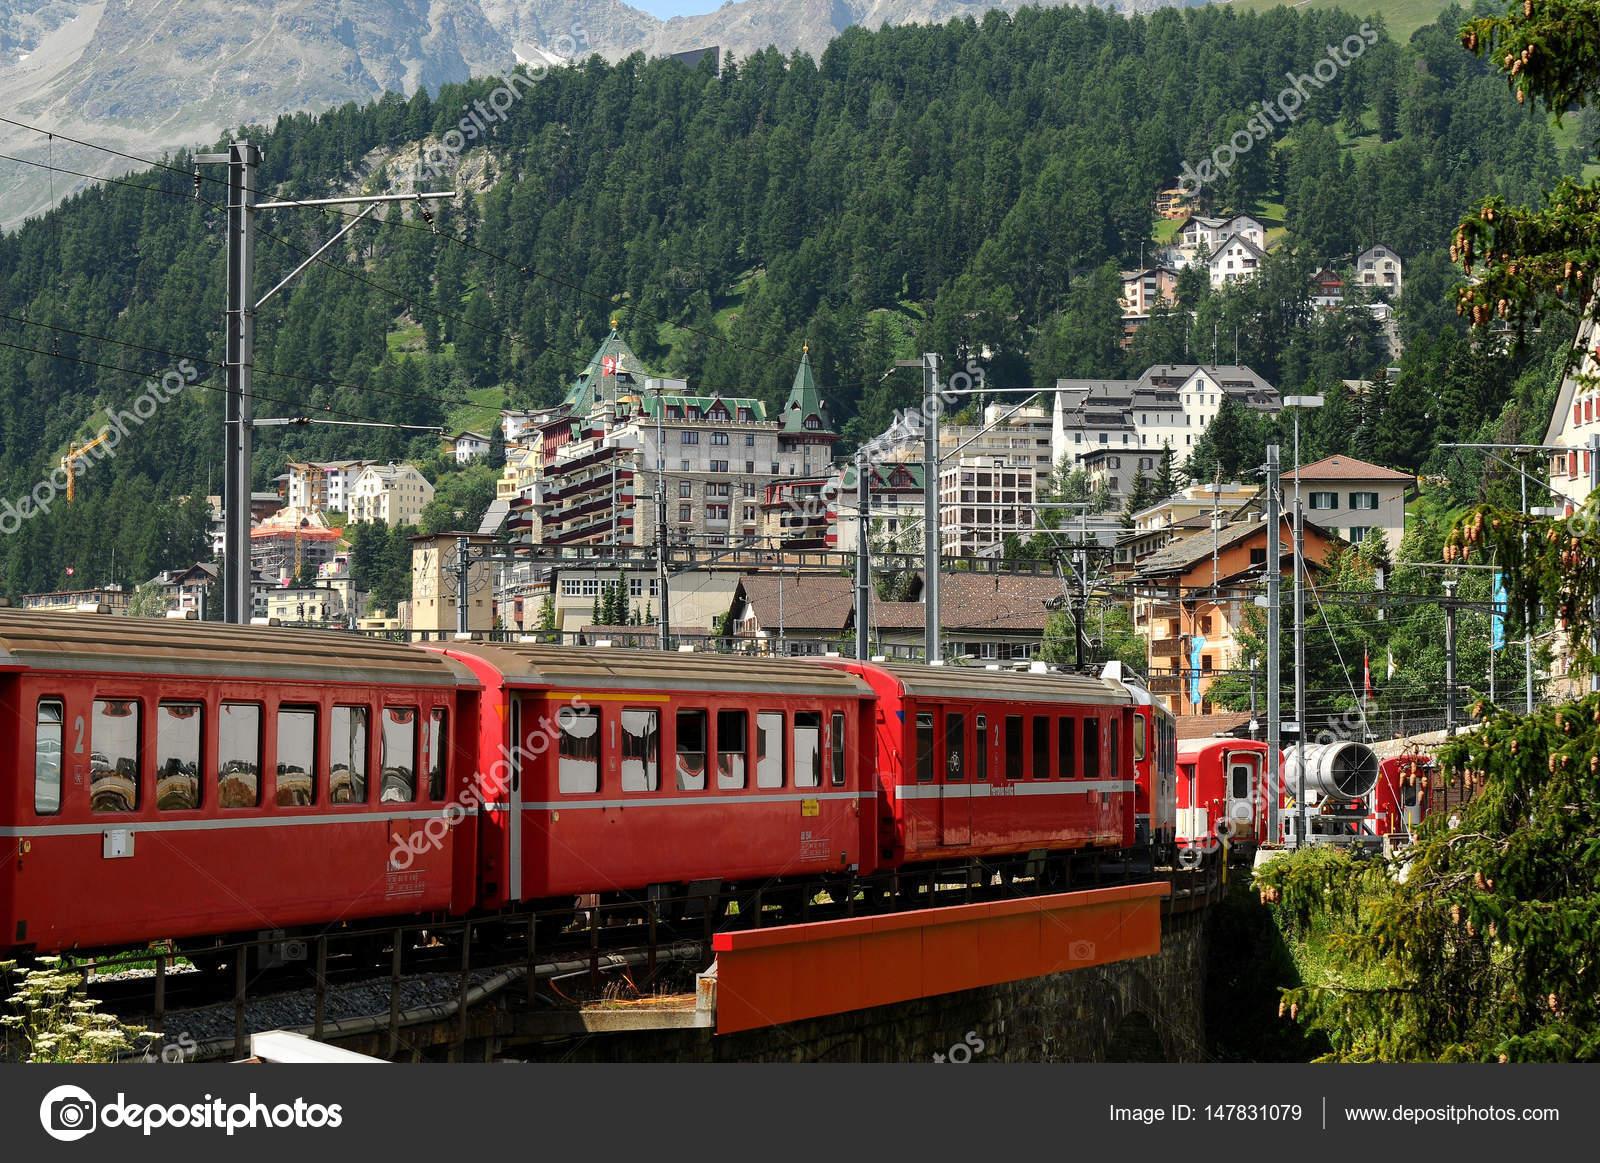 summertrain伴奏_july 2012, swiss mountain train bernina express in the summer